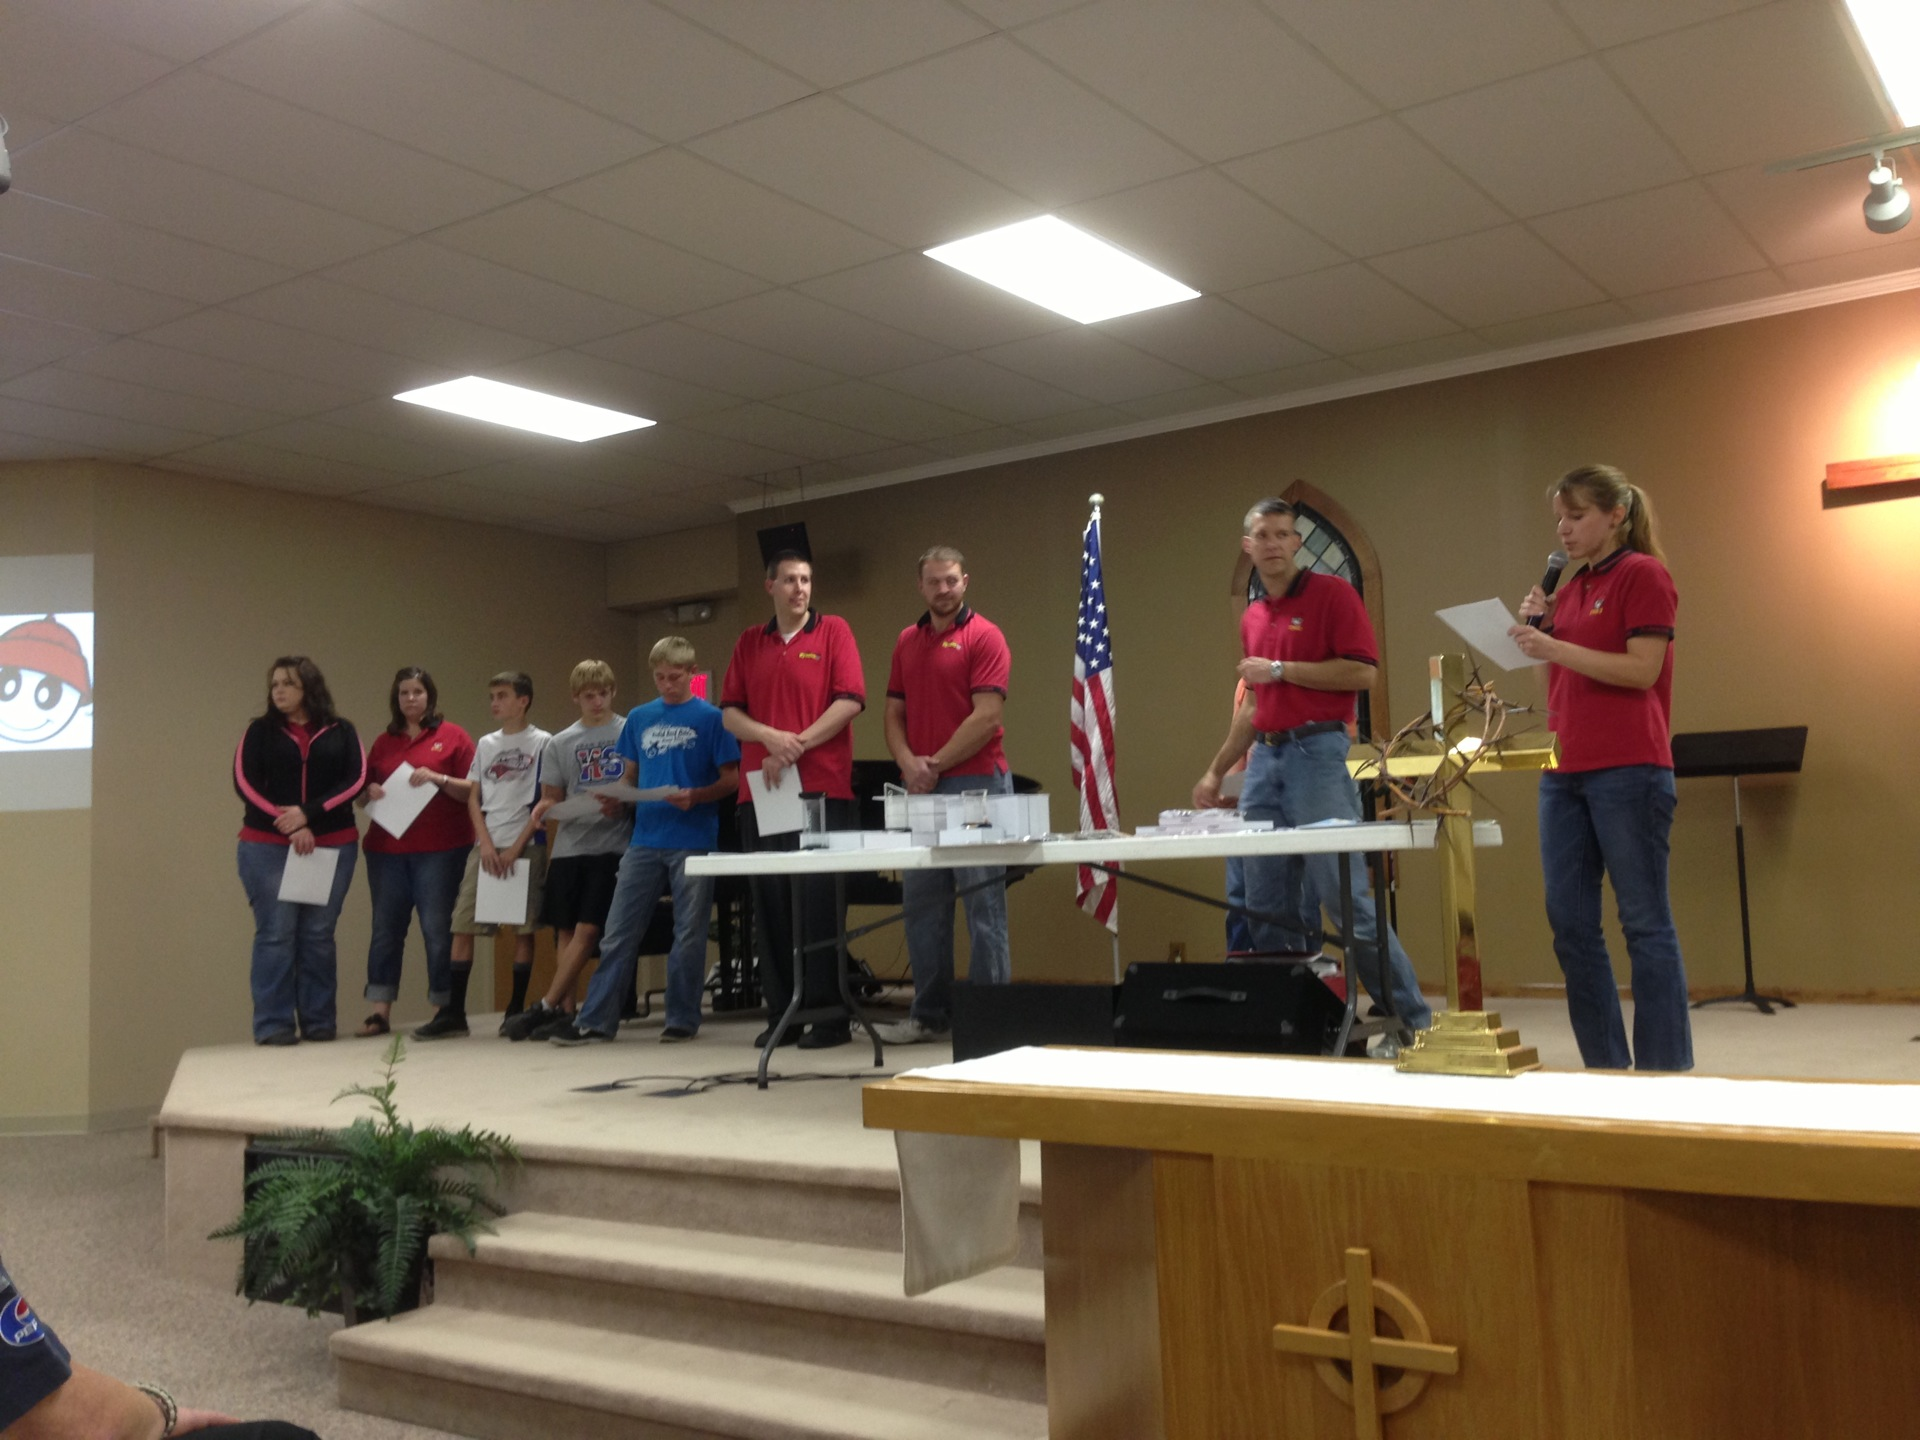 Grace Community Church   210 Mckinley St, Great Bend, KS, 67530   +1 (620) 792-7814